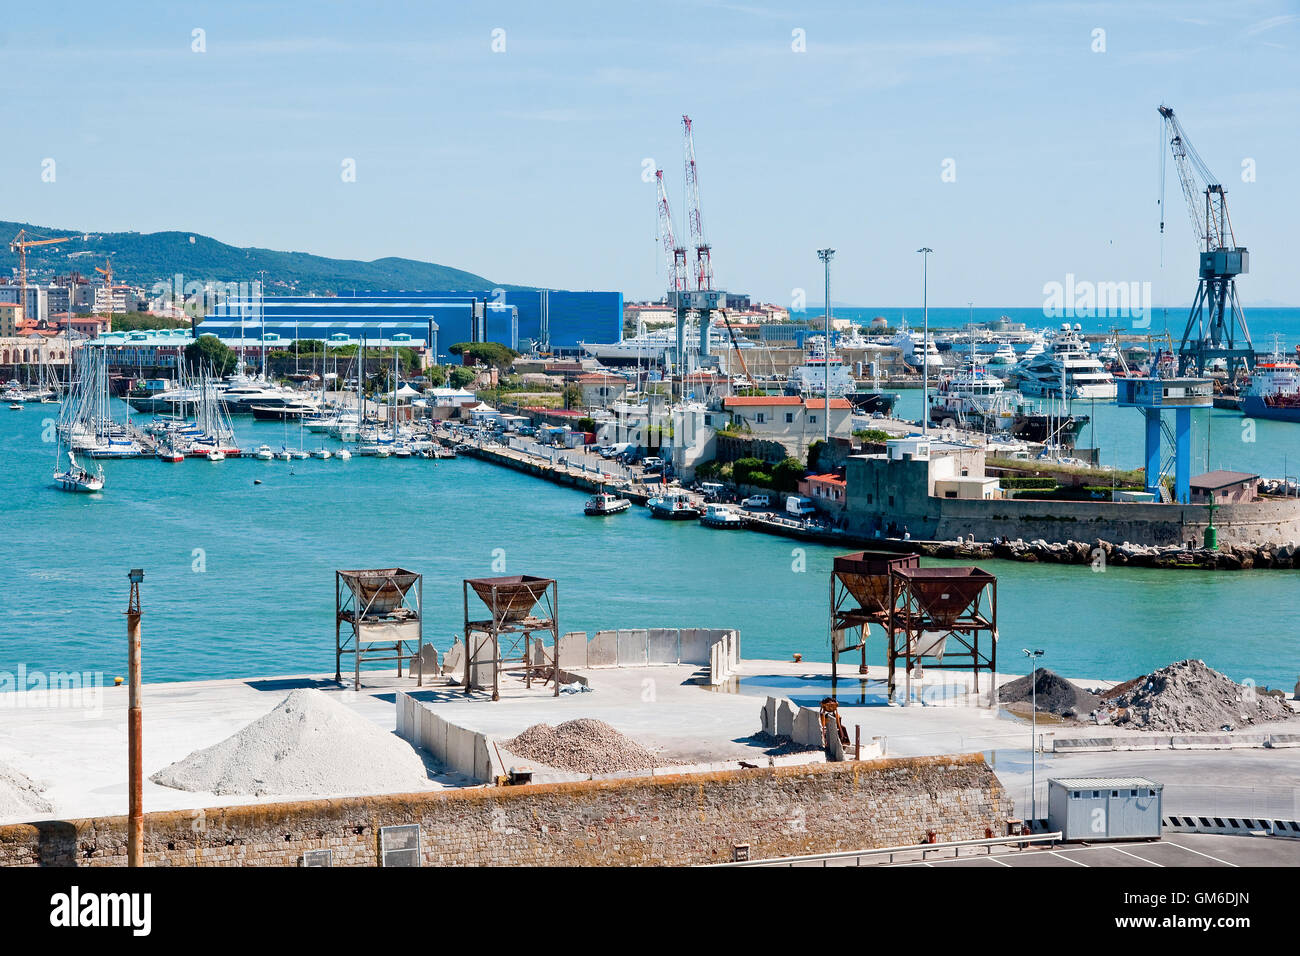 Port of Livorno, Italy - Stock Image